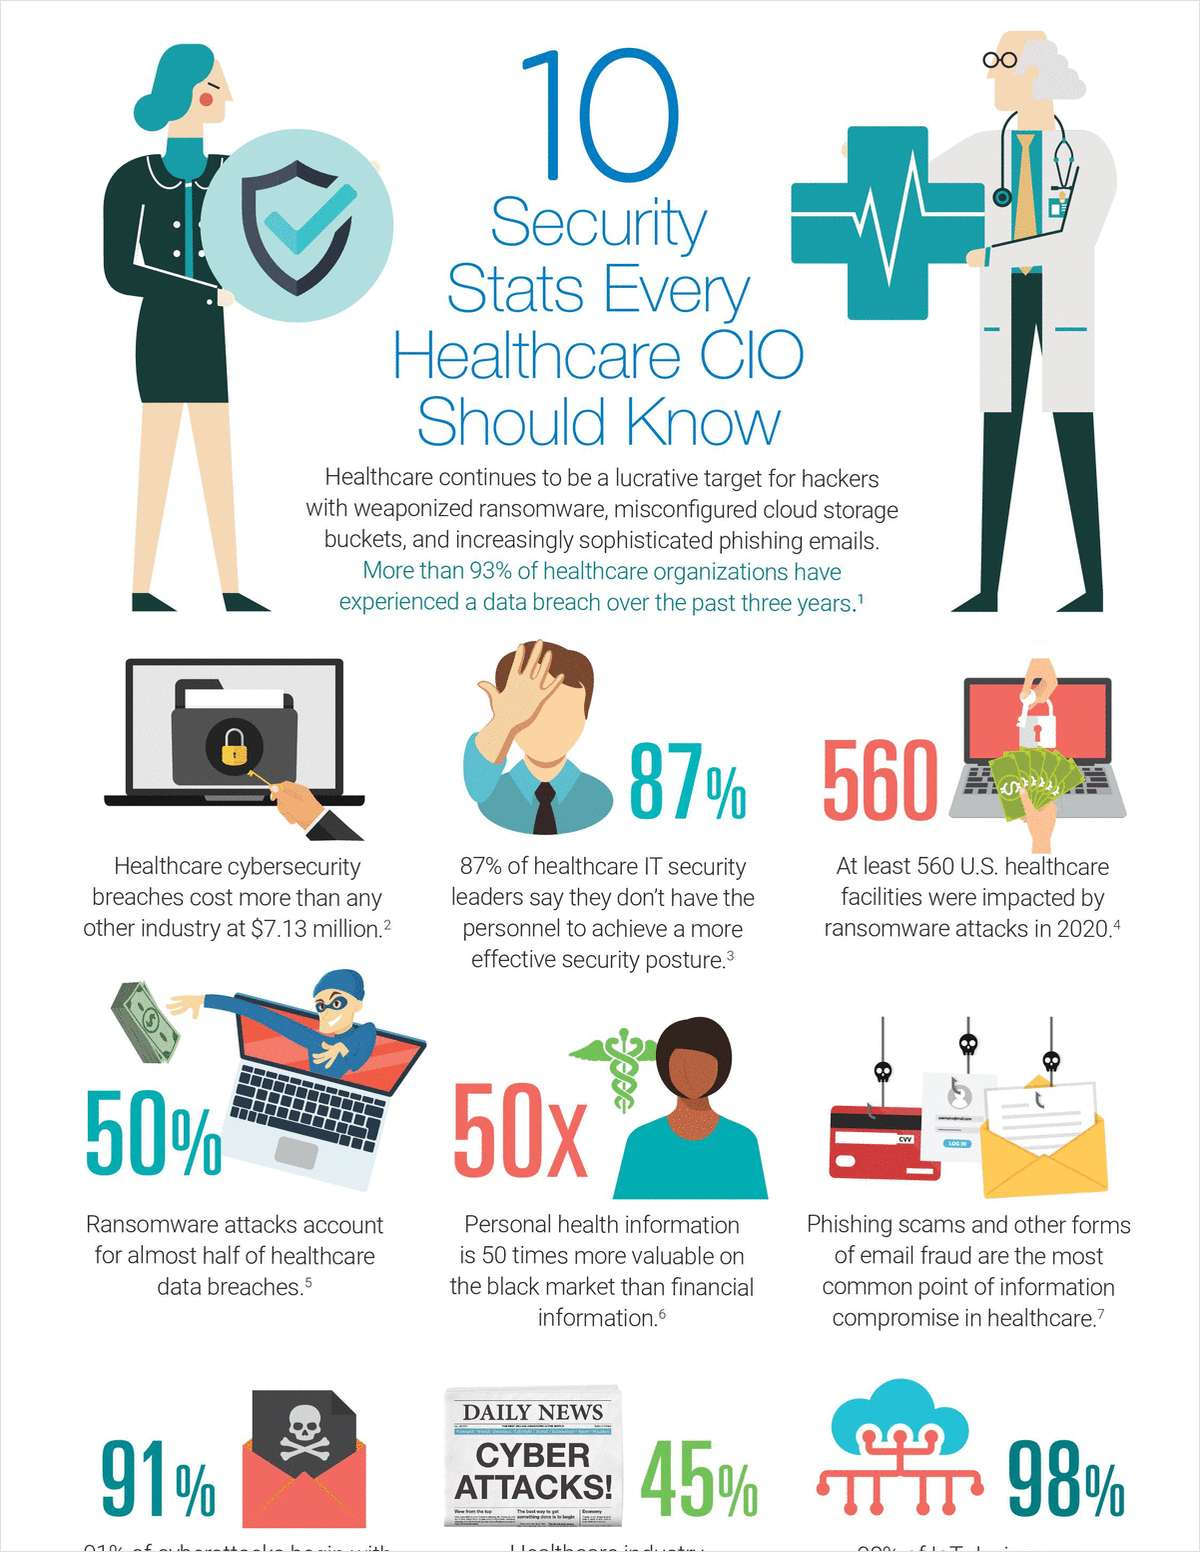 10 Security Stats Every Healthcare CIO Should Know